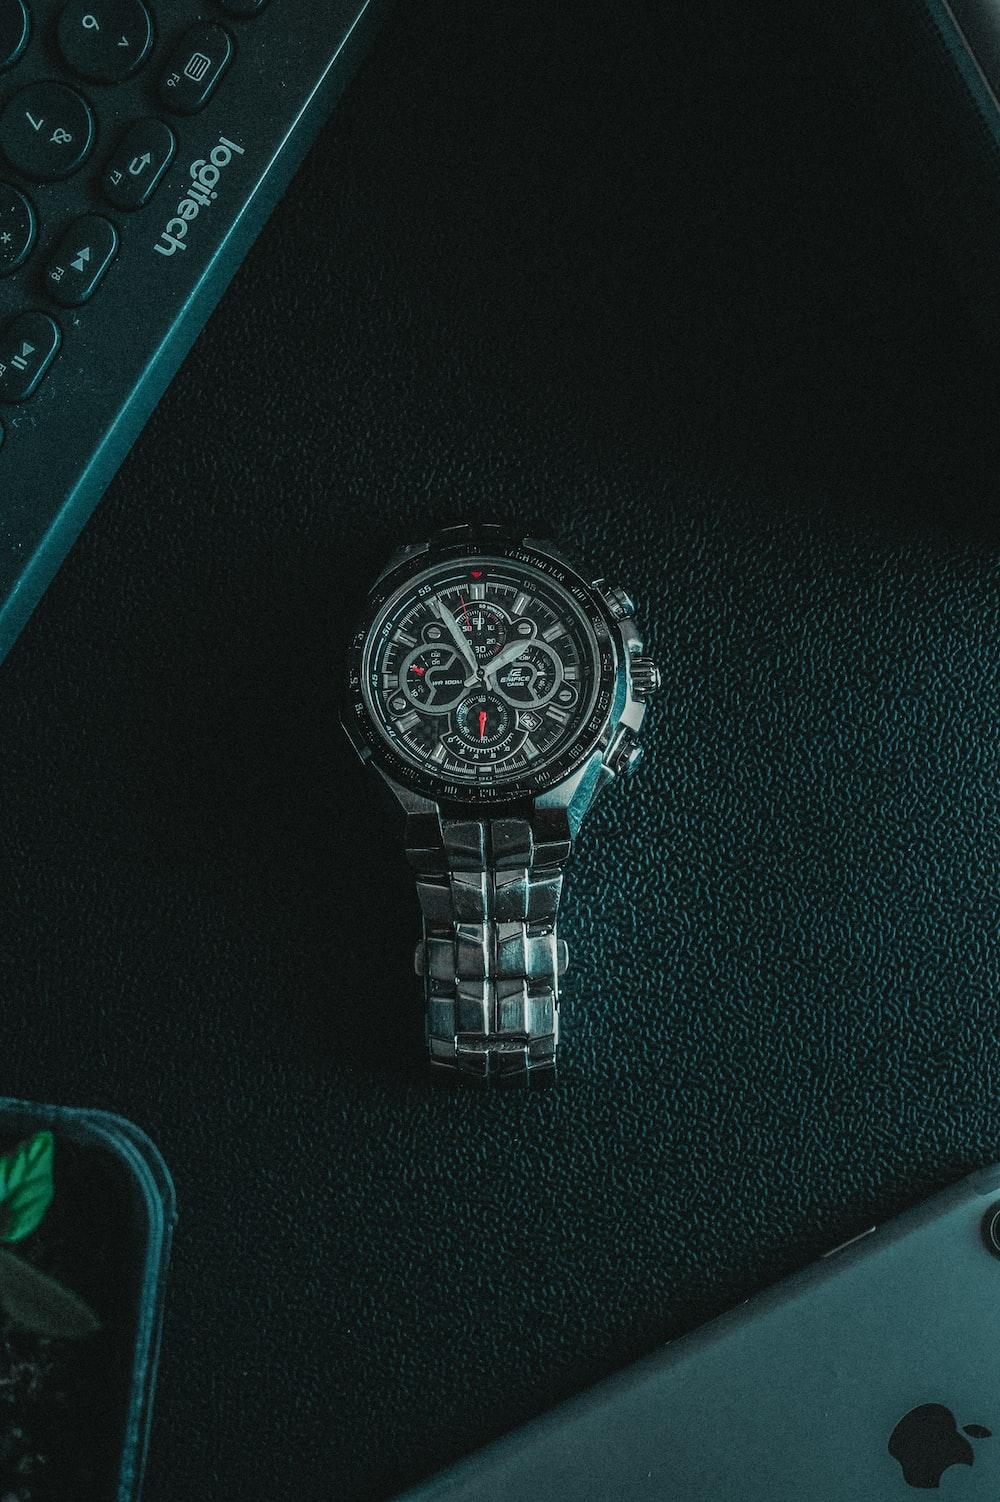 silver link bracelet round chronograph watch